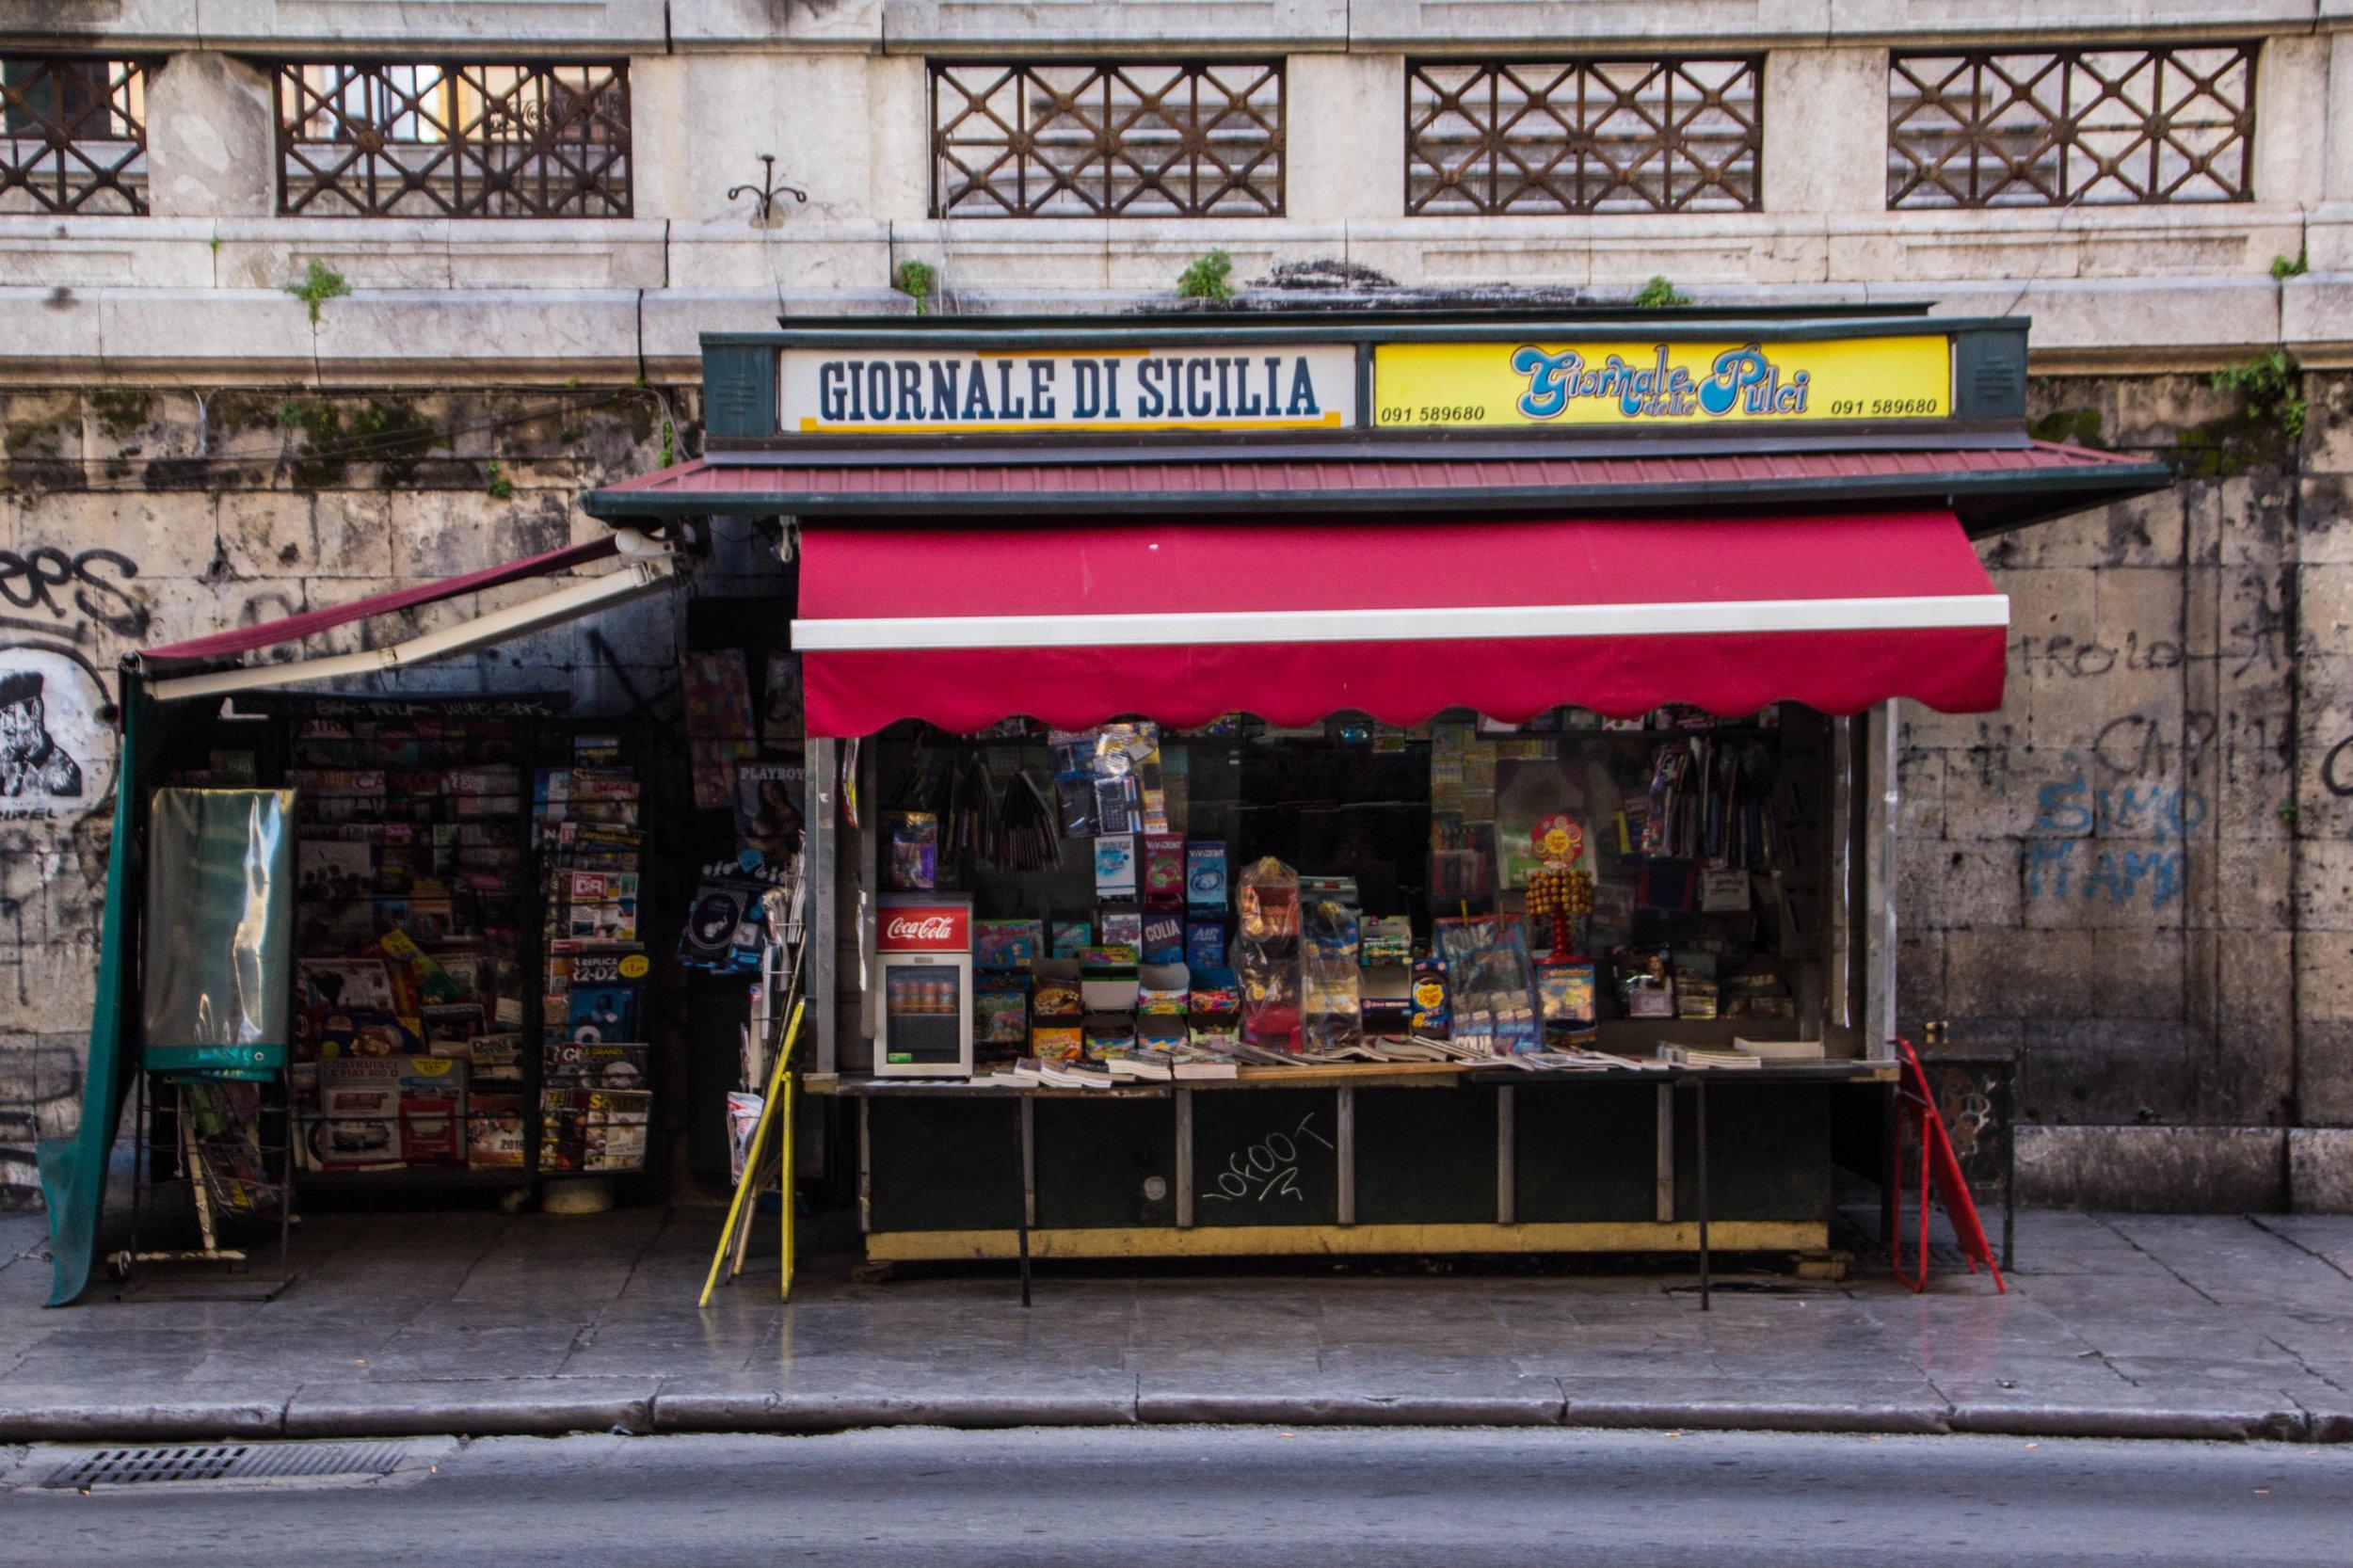 street-photography-palermo-sicily-10.jpg